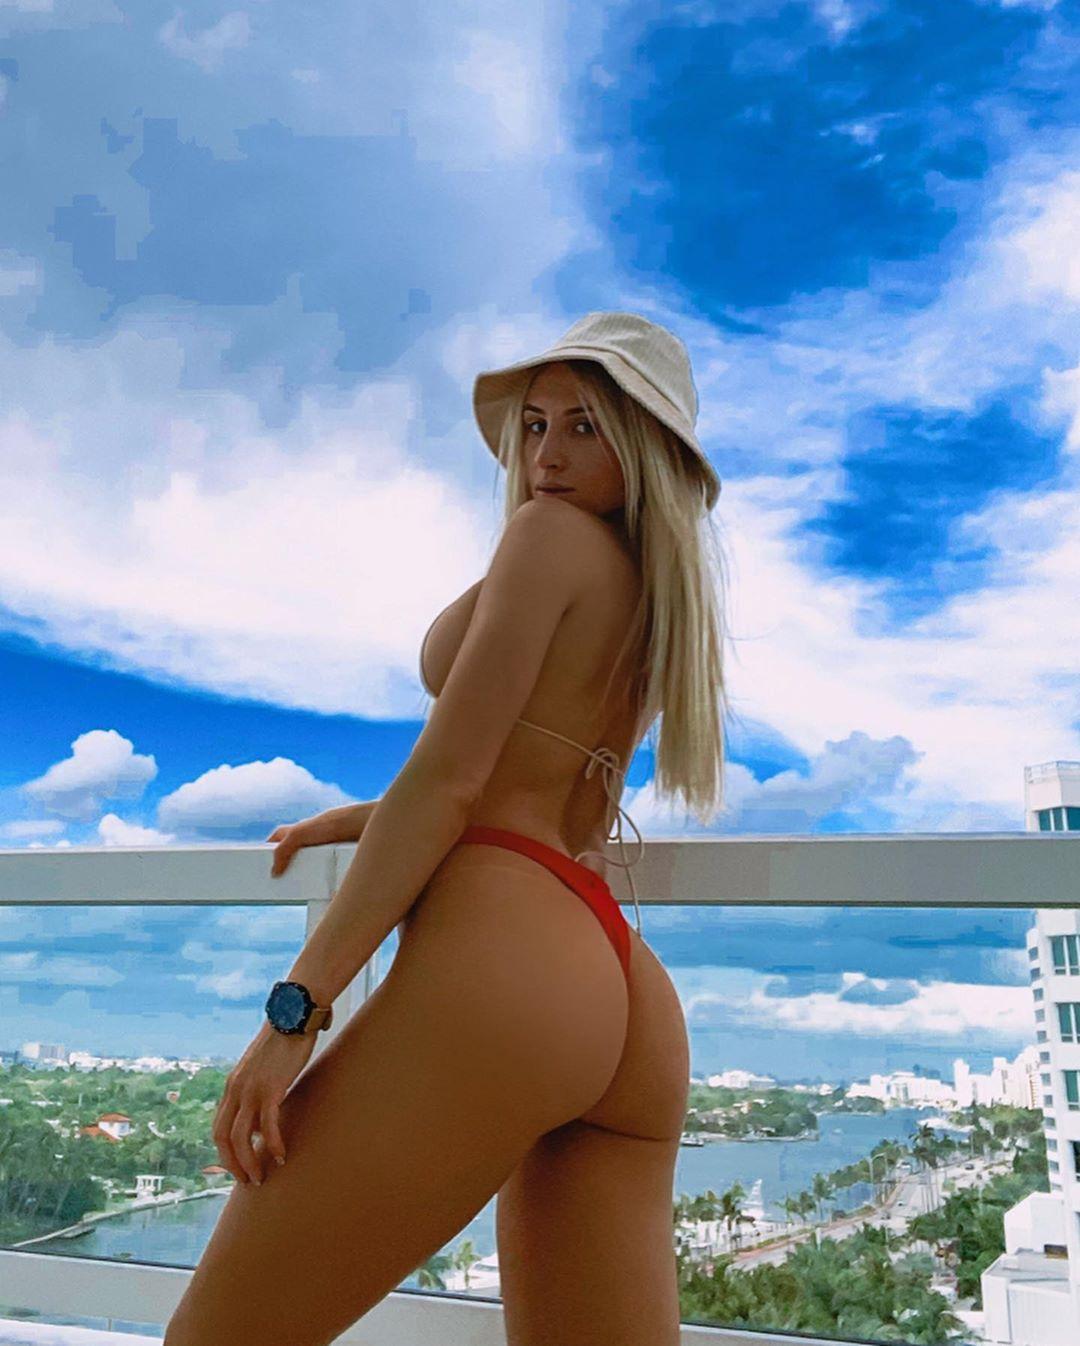 Lauren Dascalo Nude & Sex Tape Onlyfans Leaked 0022